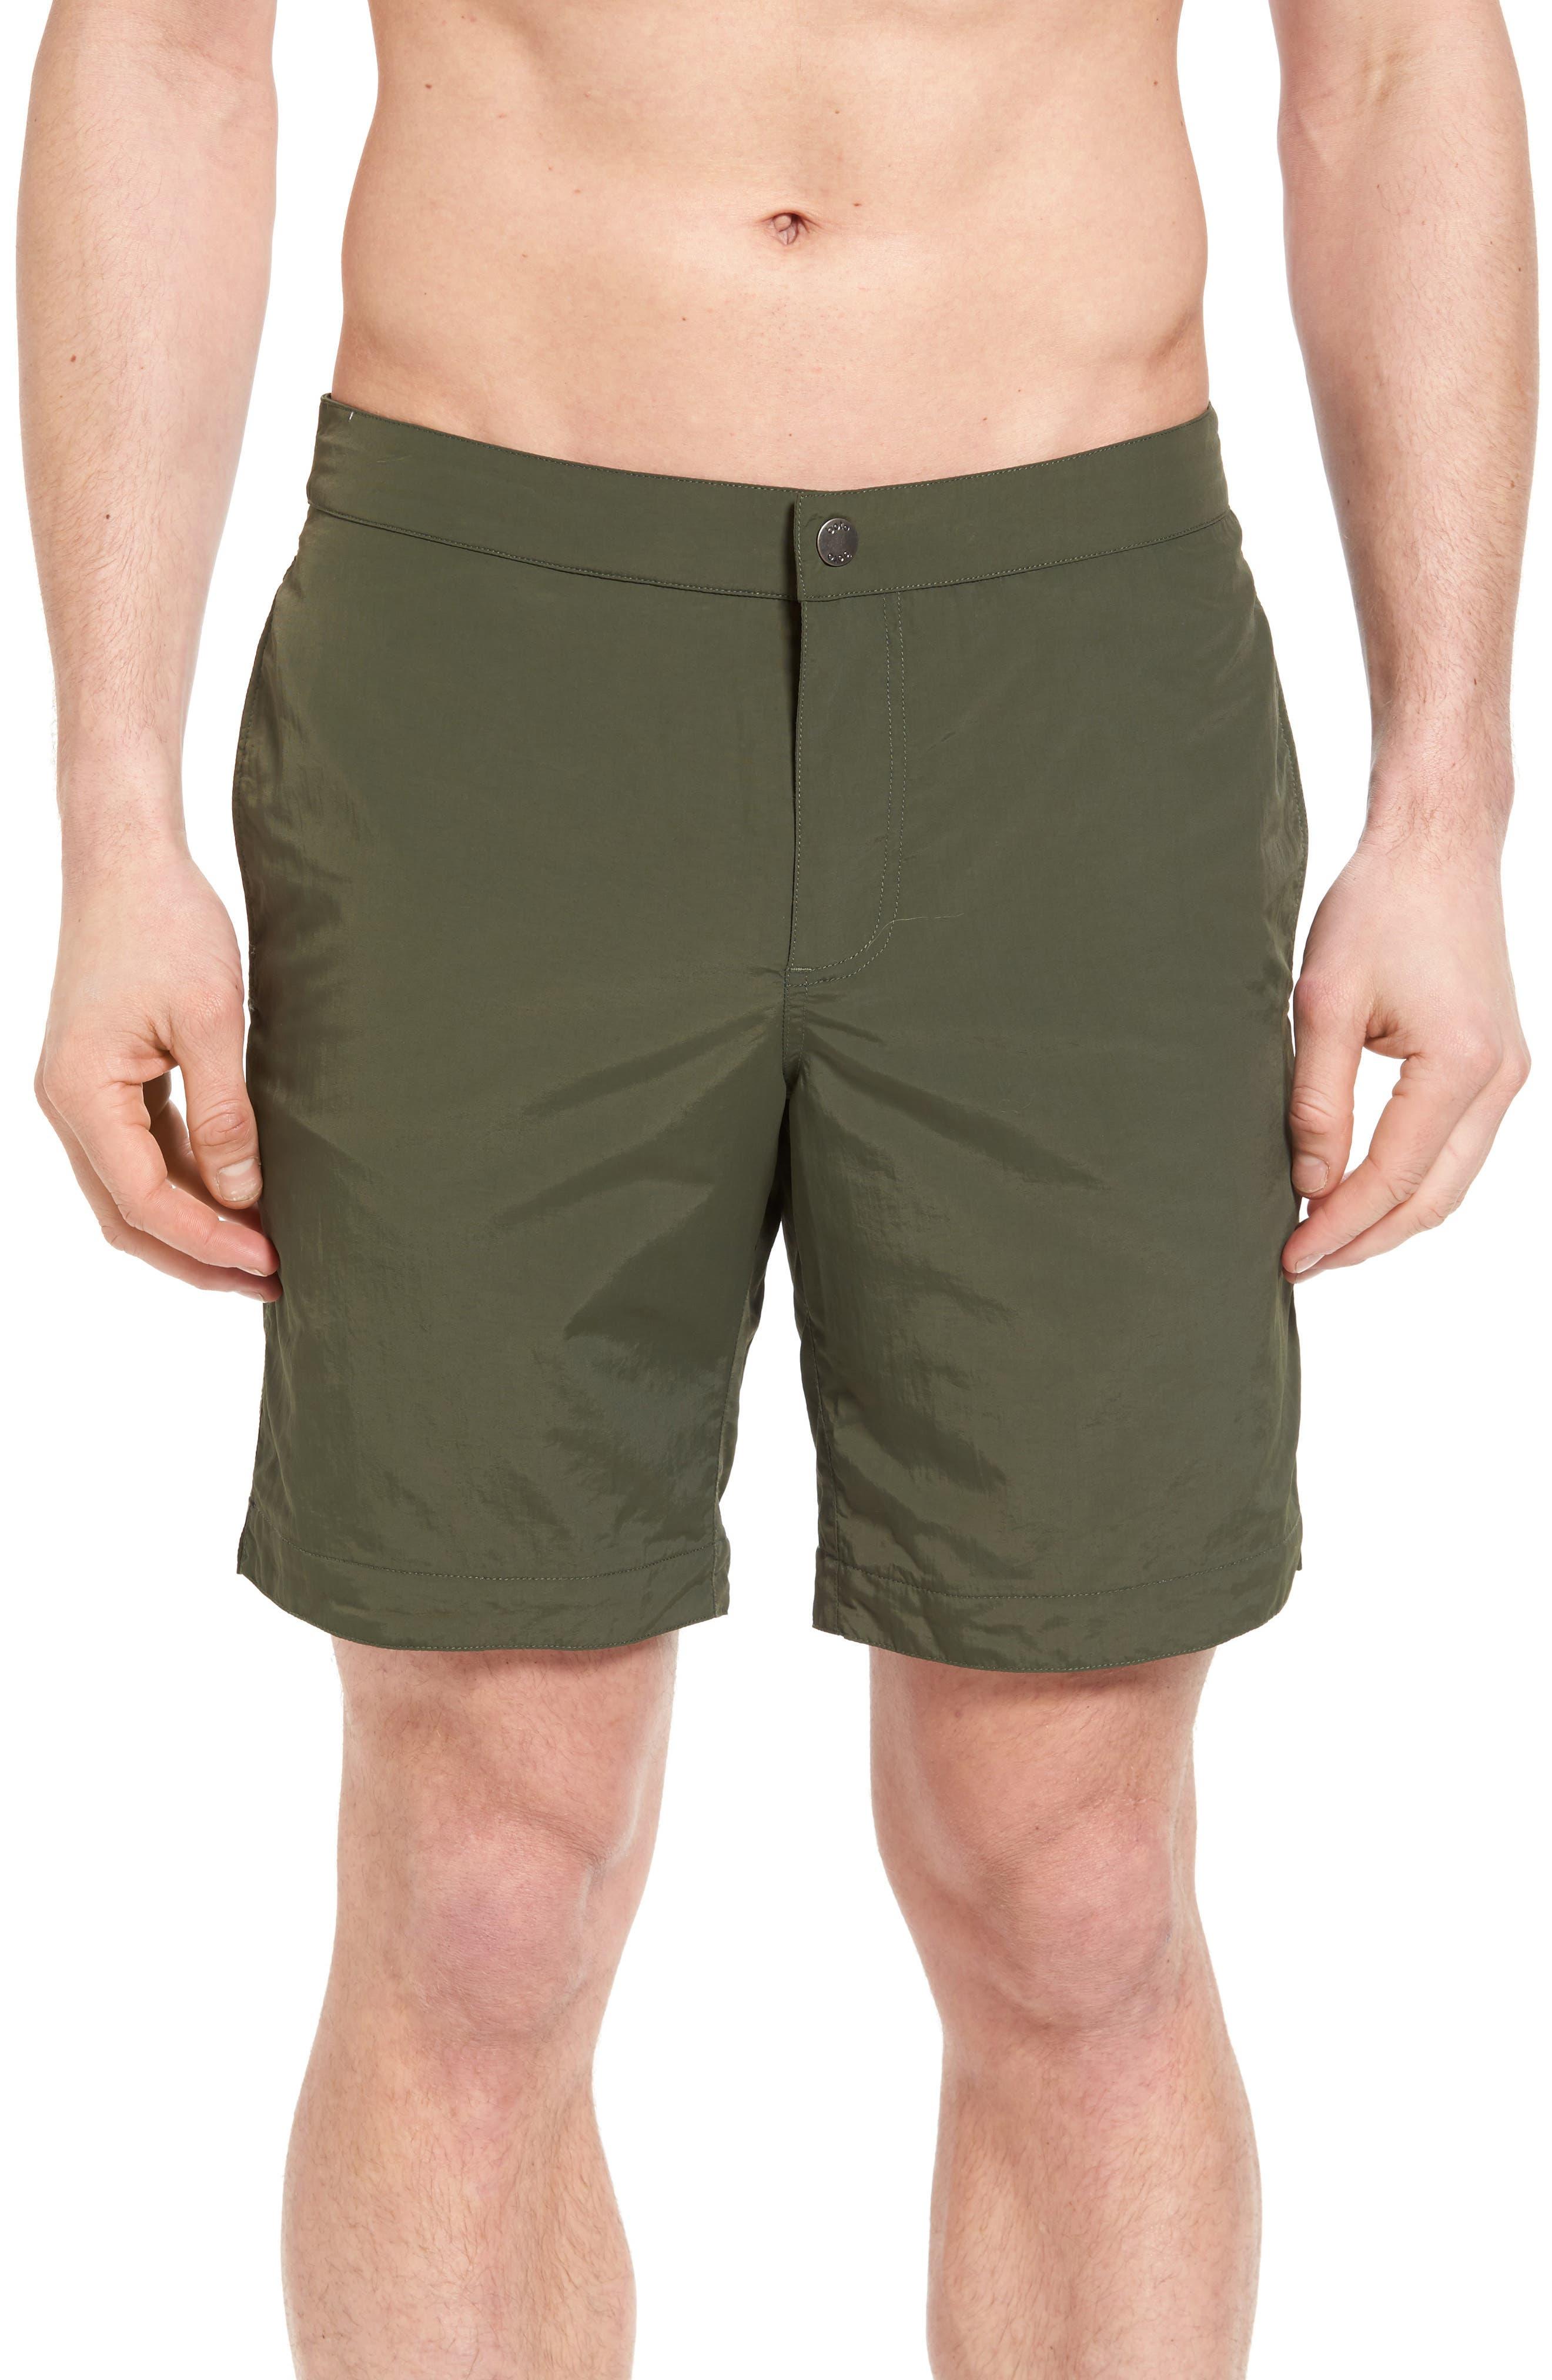 'Aruba - Island' Tailored Fit 8.5 Inch Board Shorts,                             Main thumbnail 2, color,